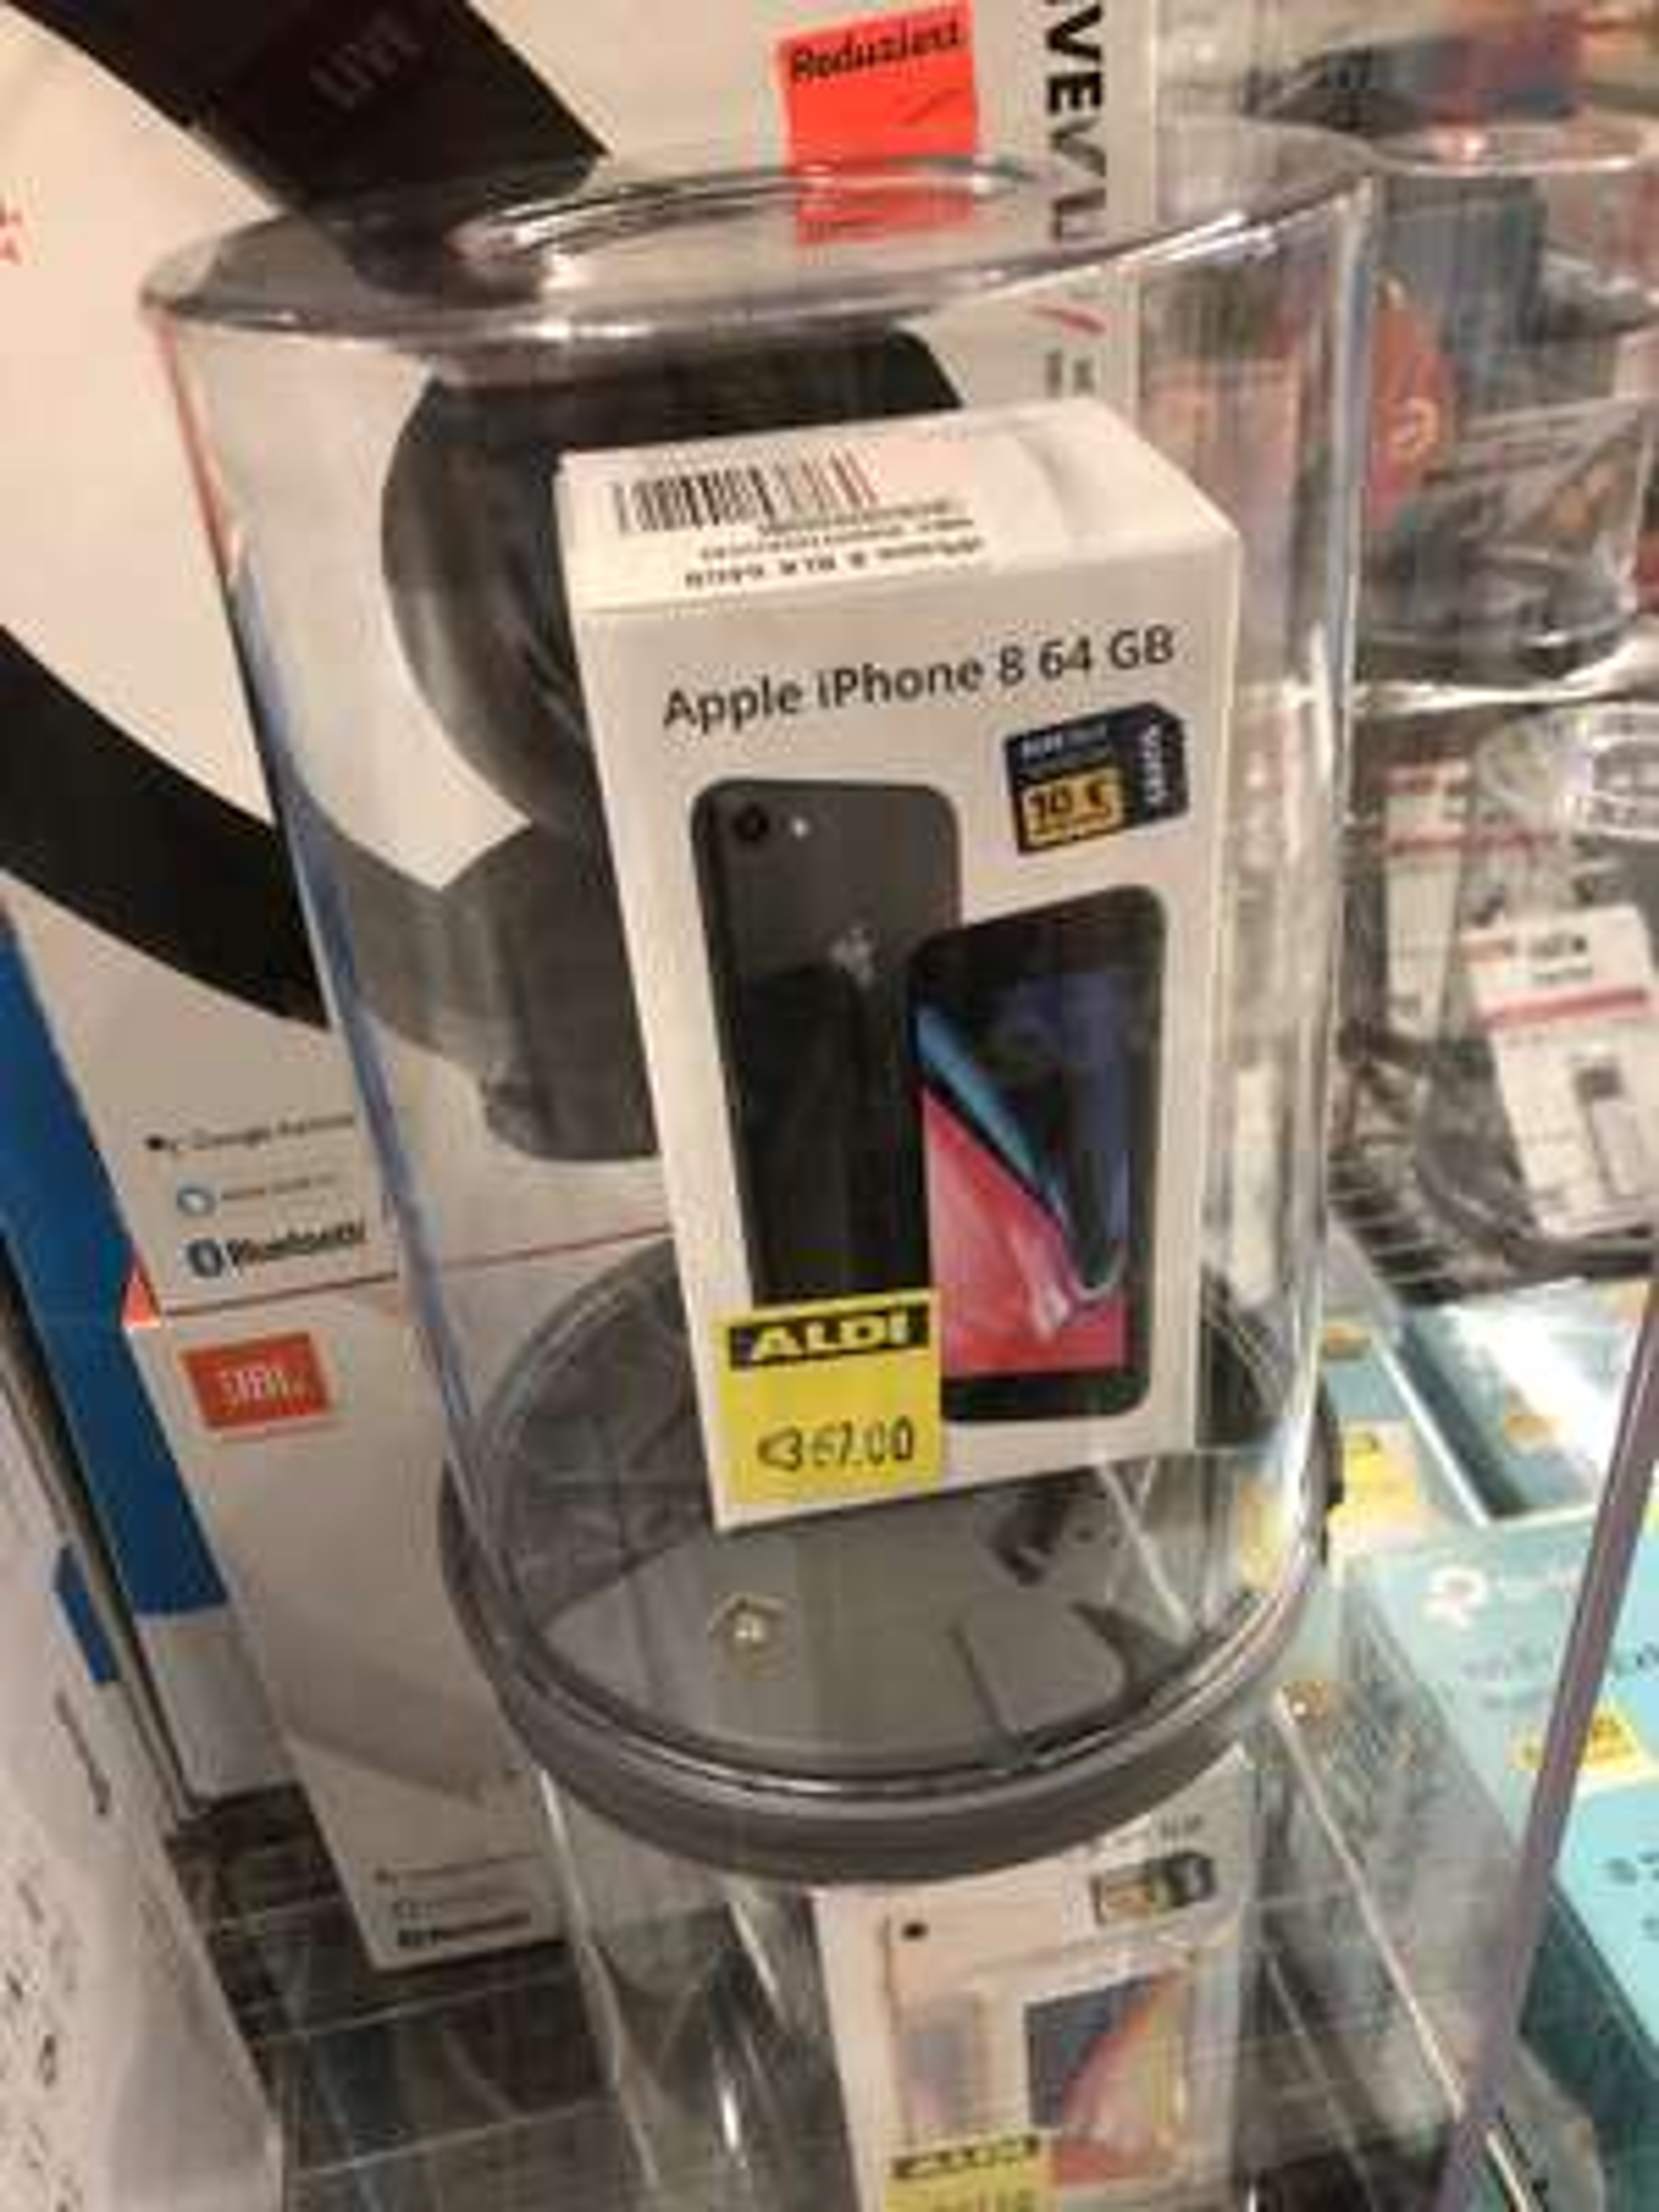 iPhone 8 64GB Lokal Aldi Lindenberg Bucher weg 2, 16356 Ahrensfelde